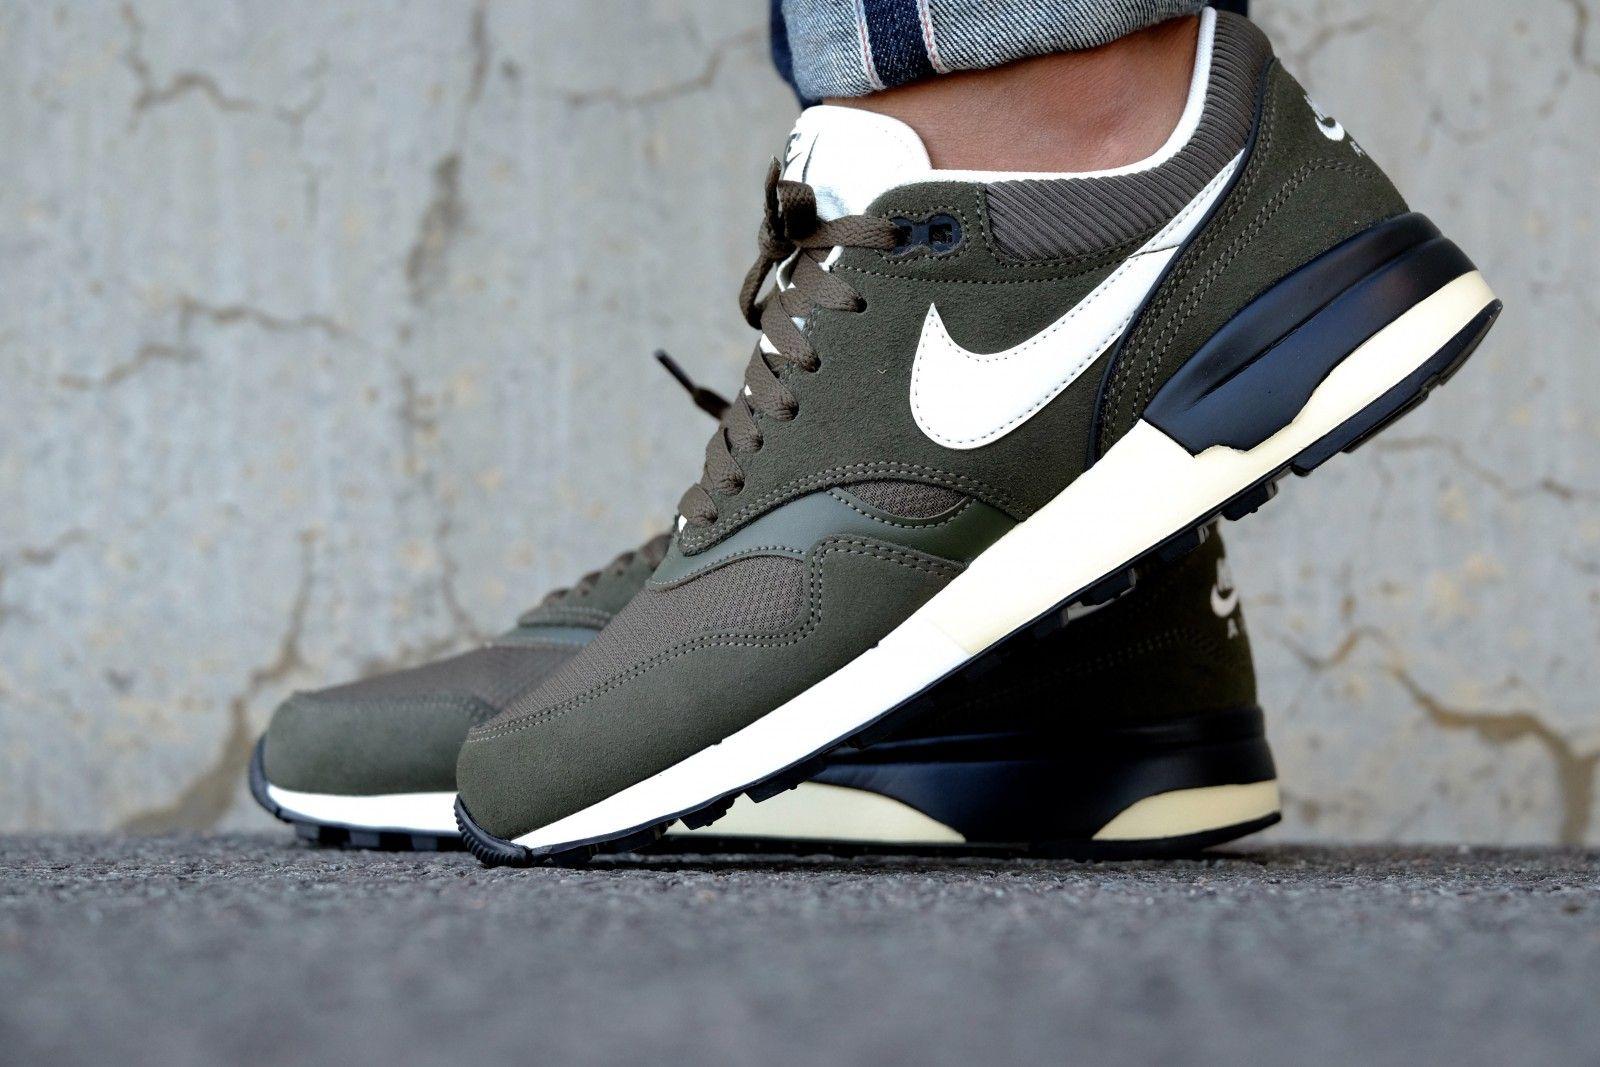 uk availability 0aa21 5a802 Nike Air Odyssey Cargo Khaki Sail-Wolf Grey - Sneaker District Amsterdam